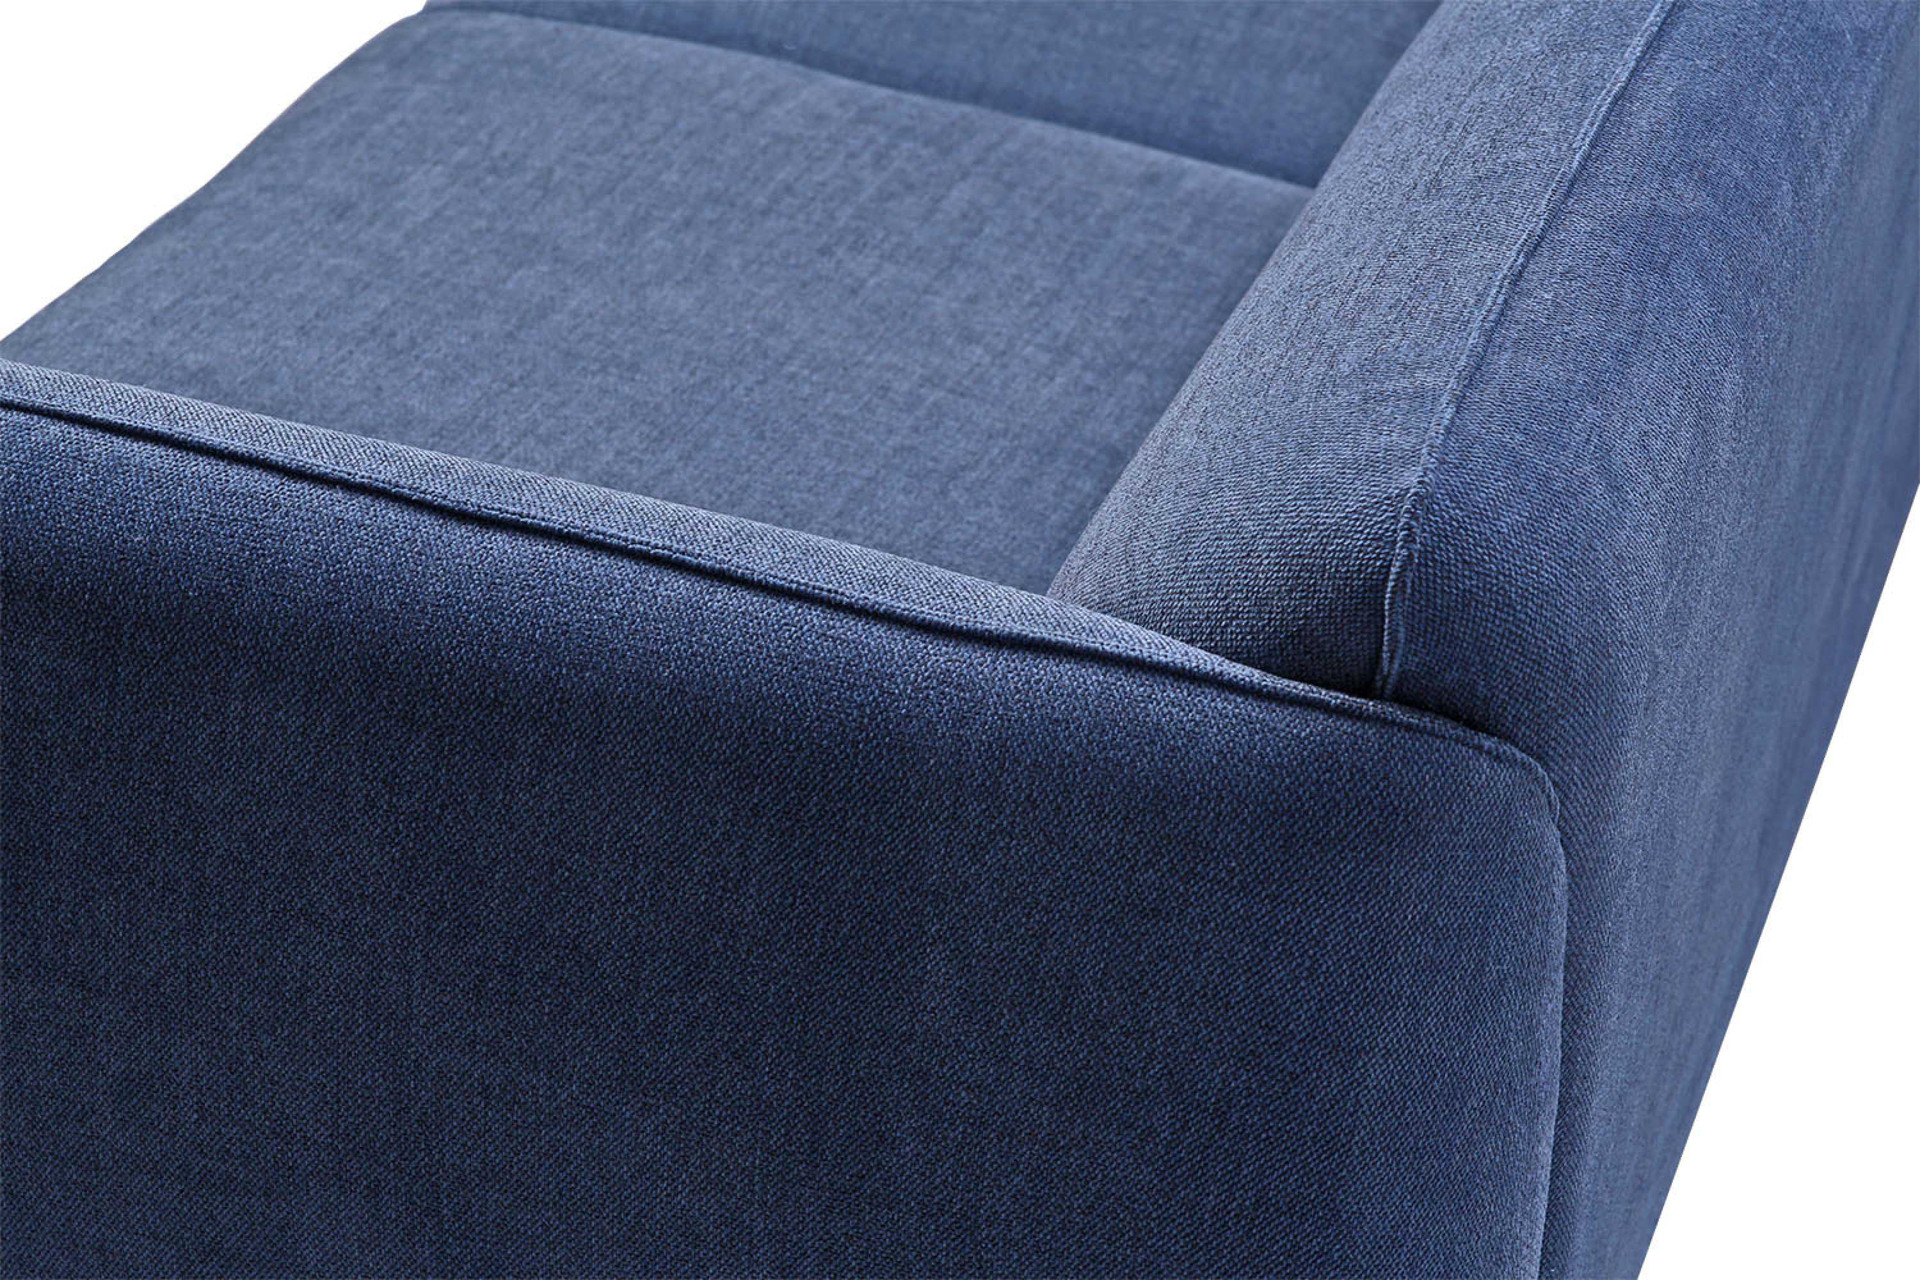 Sofa Algard